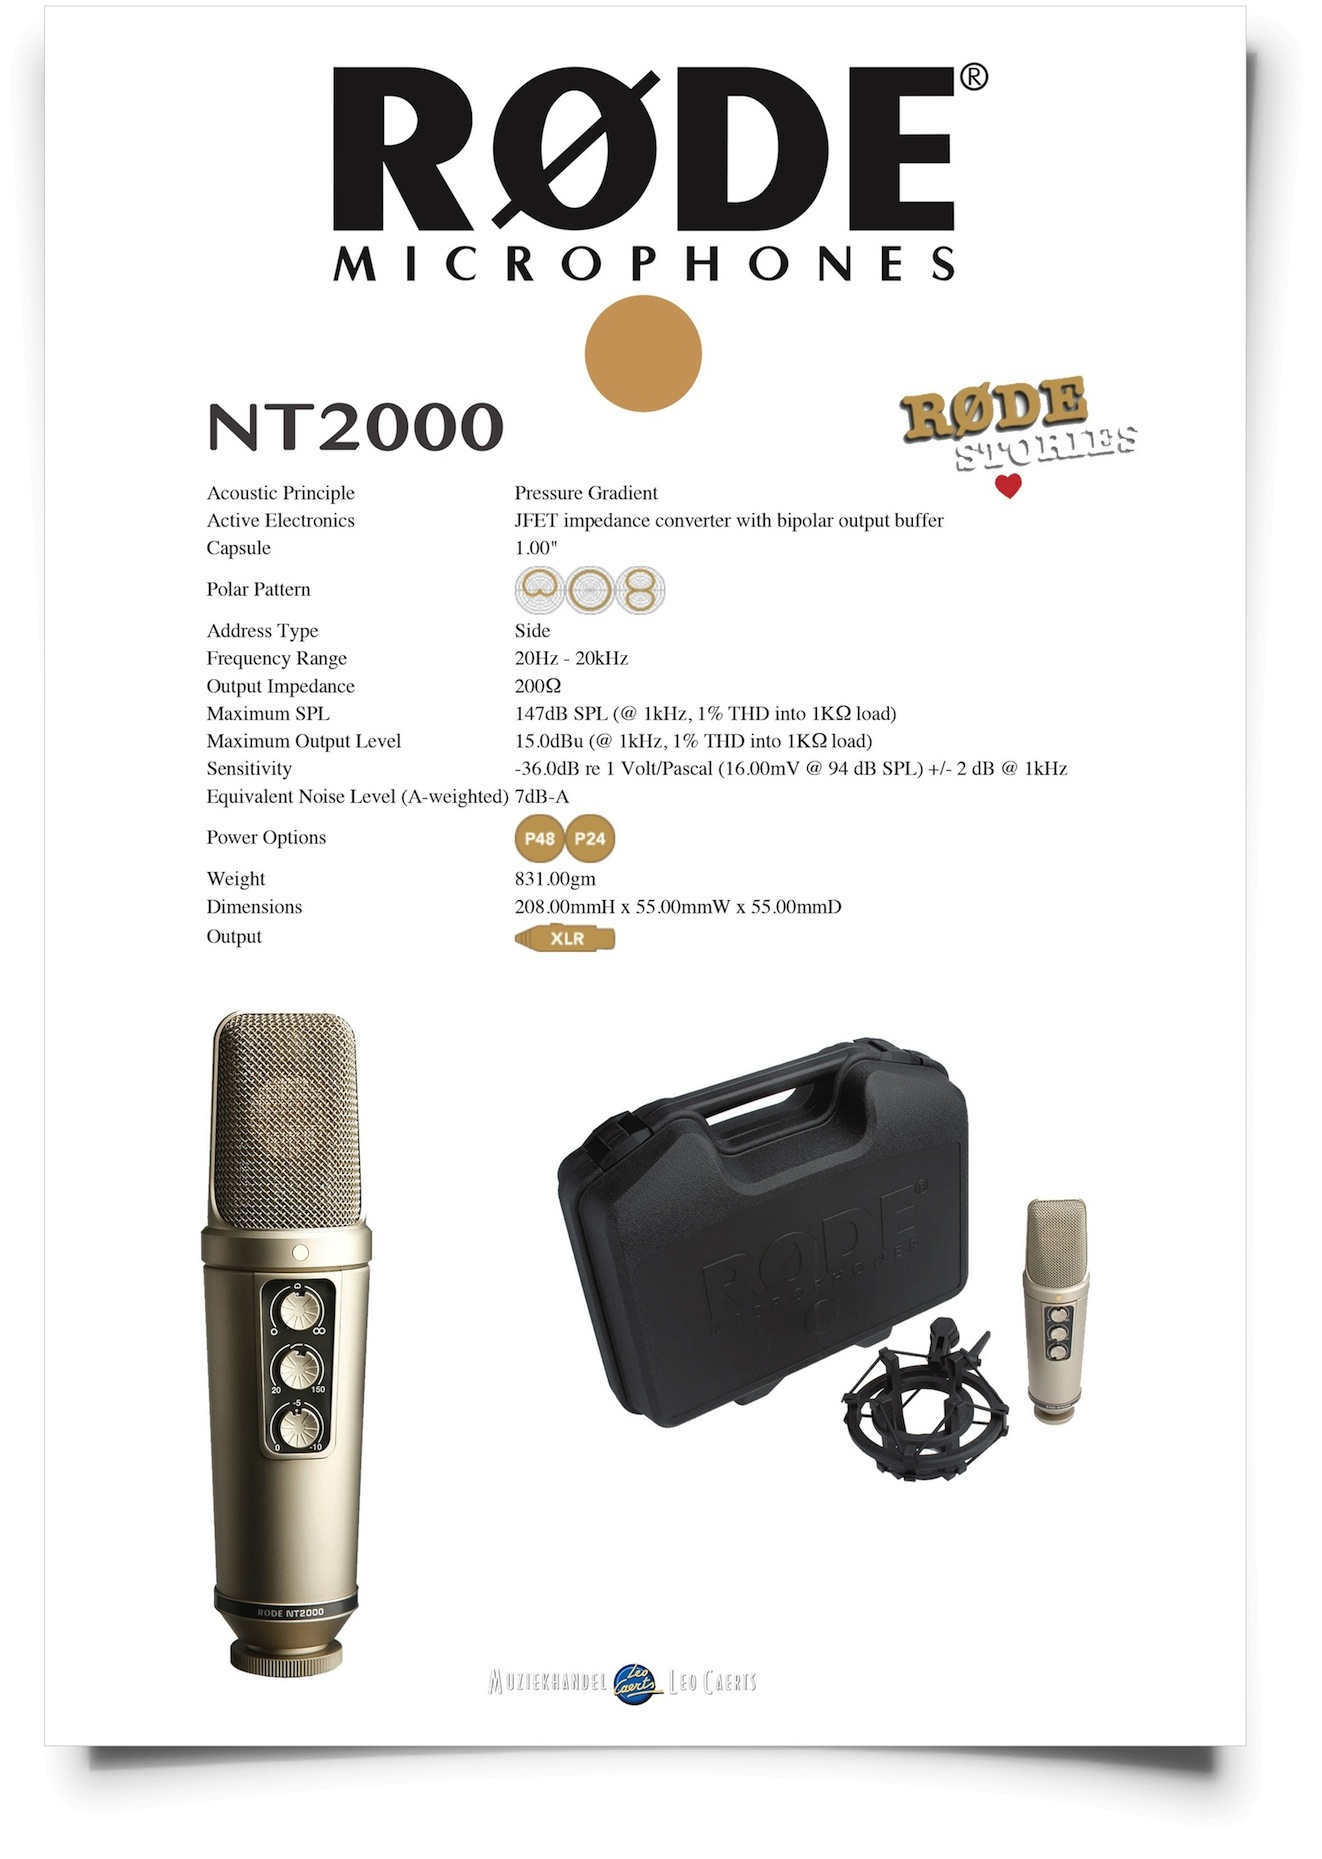 Rode NT2000